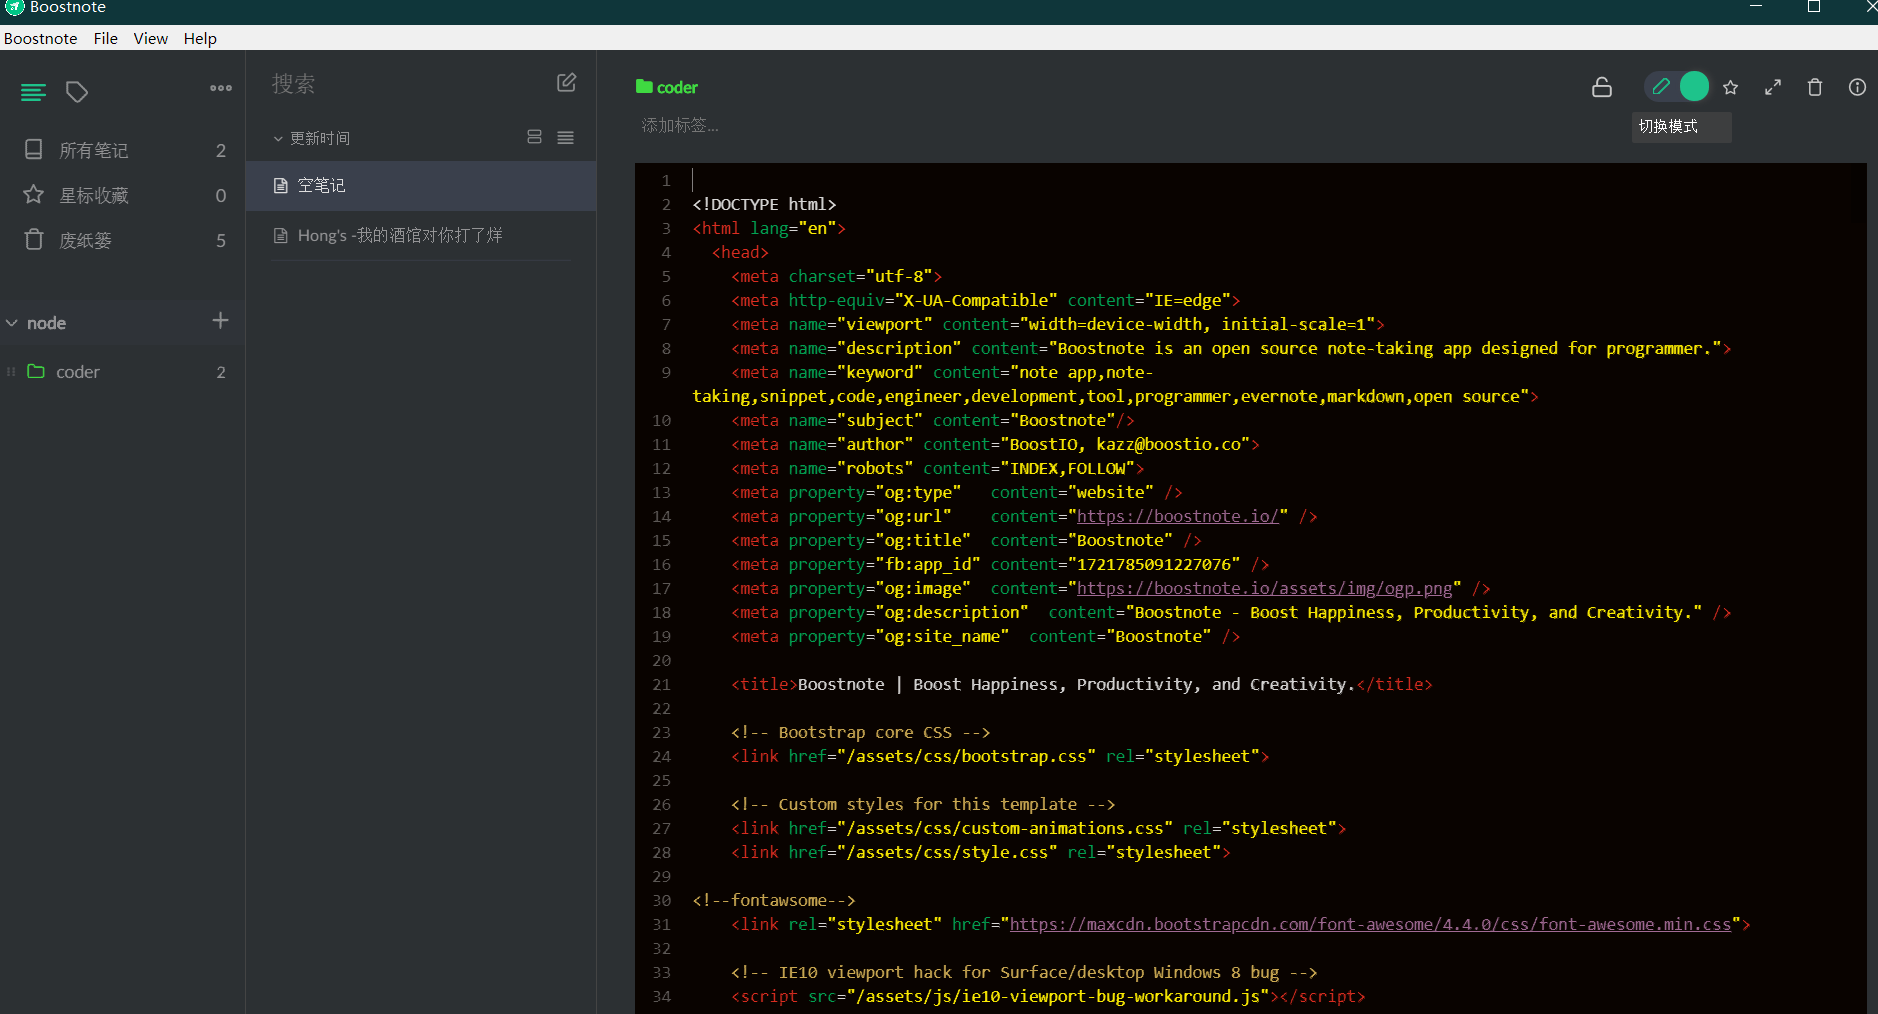 开源markdown写作工具 Boostnote 0.13